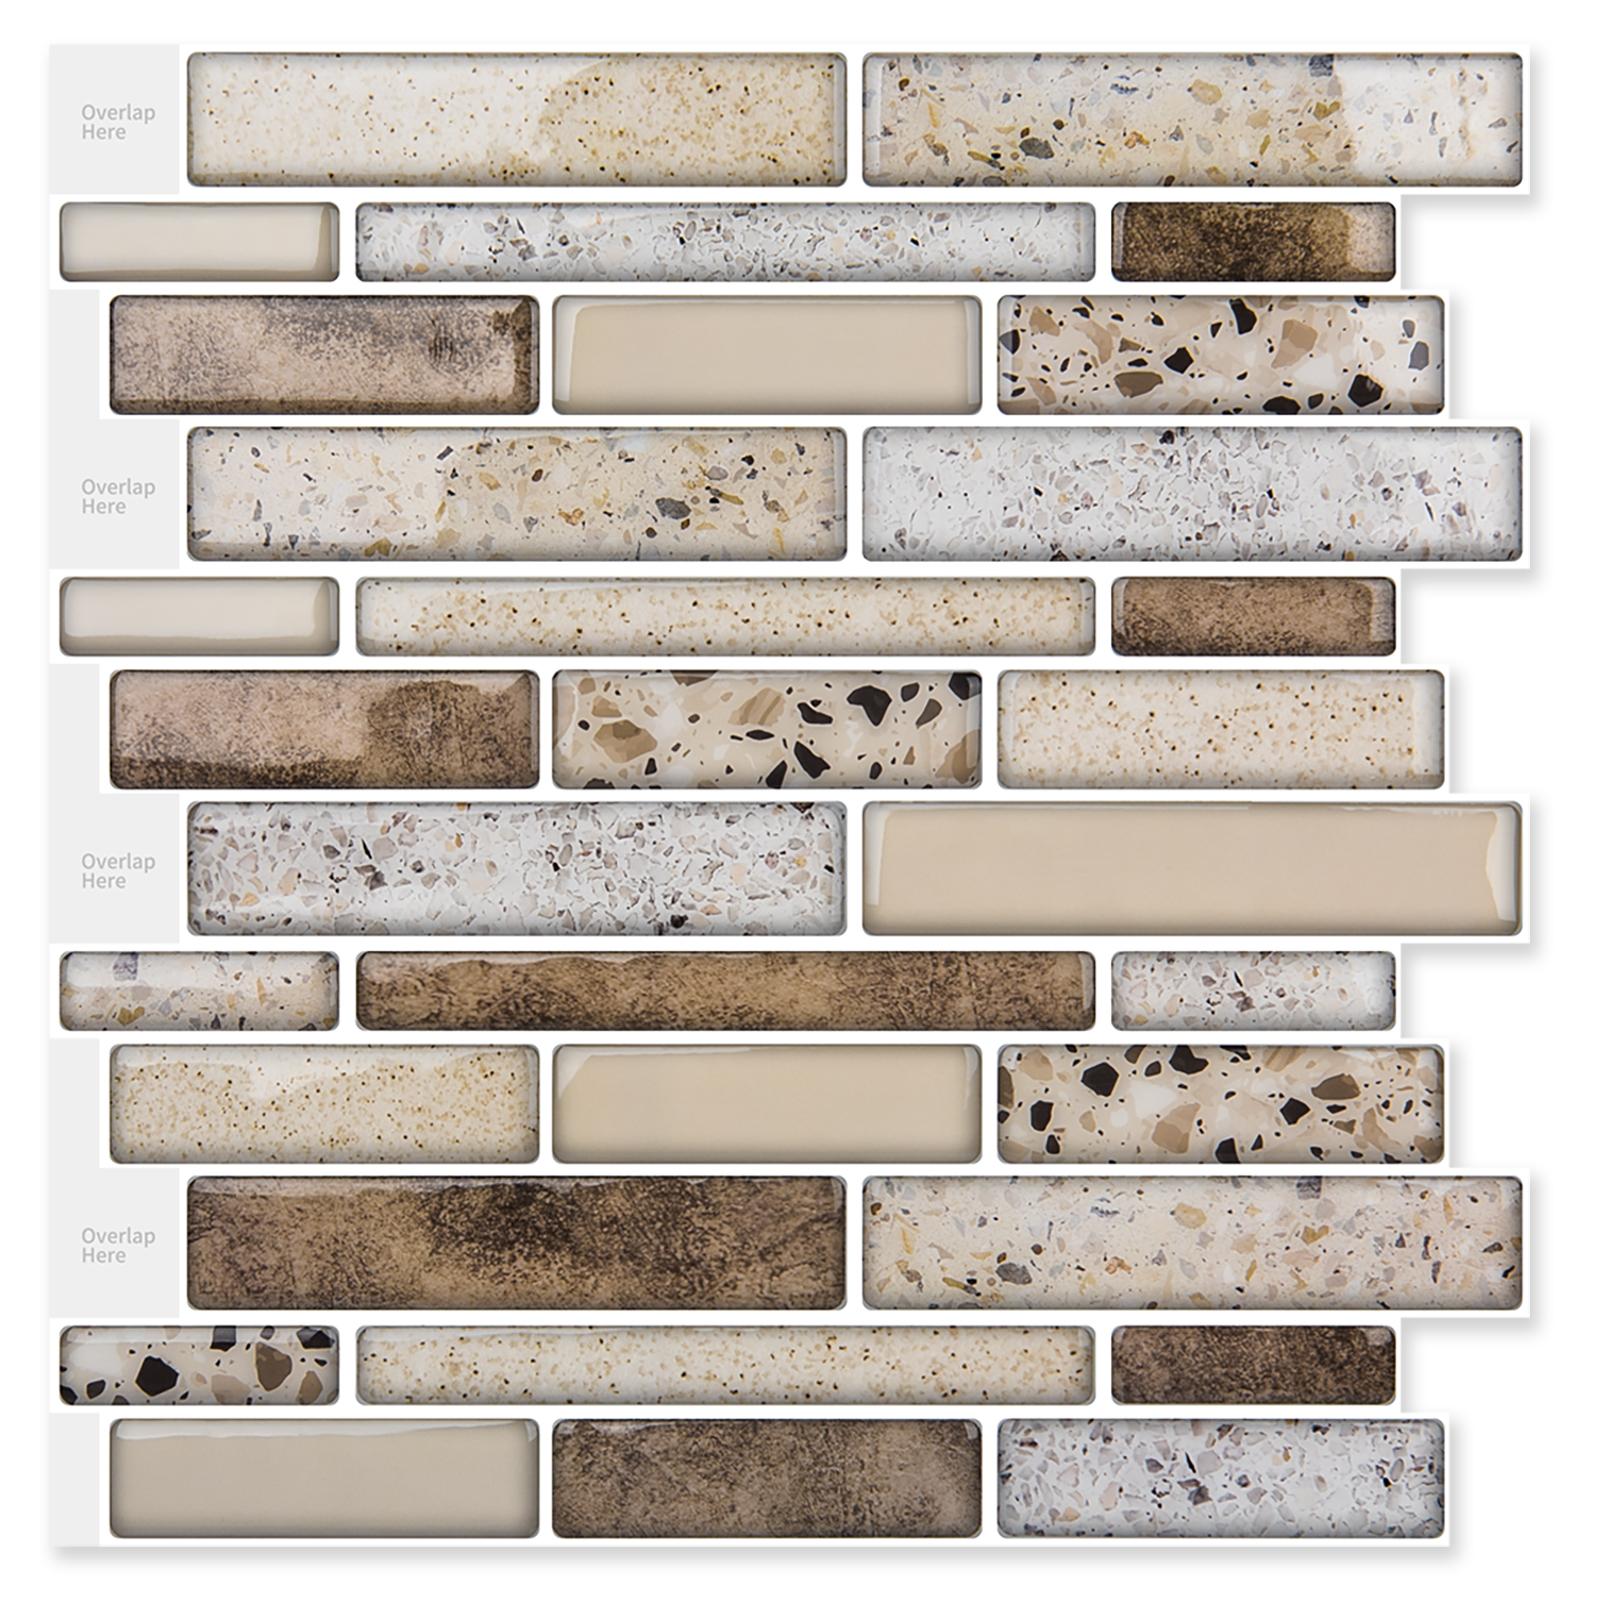 A17021 - Peel & Stick Mosaic 11.2 x 12in 10 Pcs Backsplash Tiles 9.5 Sq.Ft